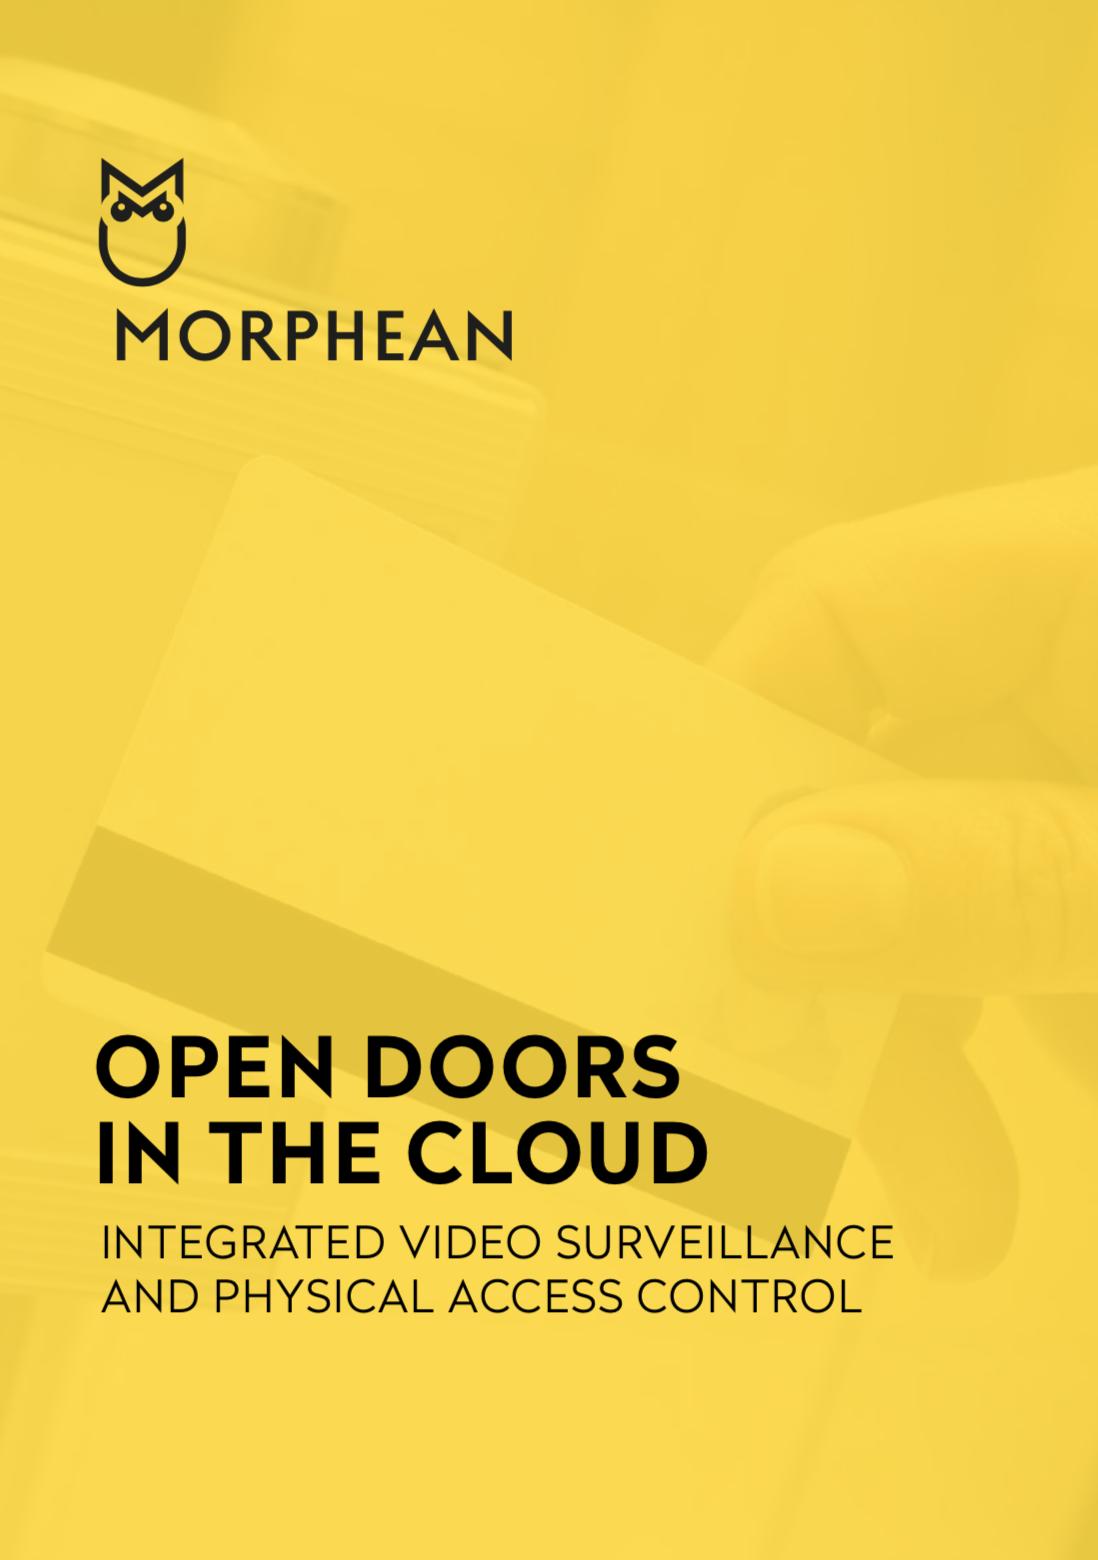 Download Access Control Brochure  - Morphean